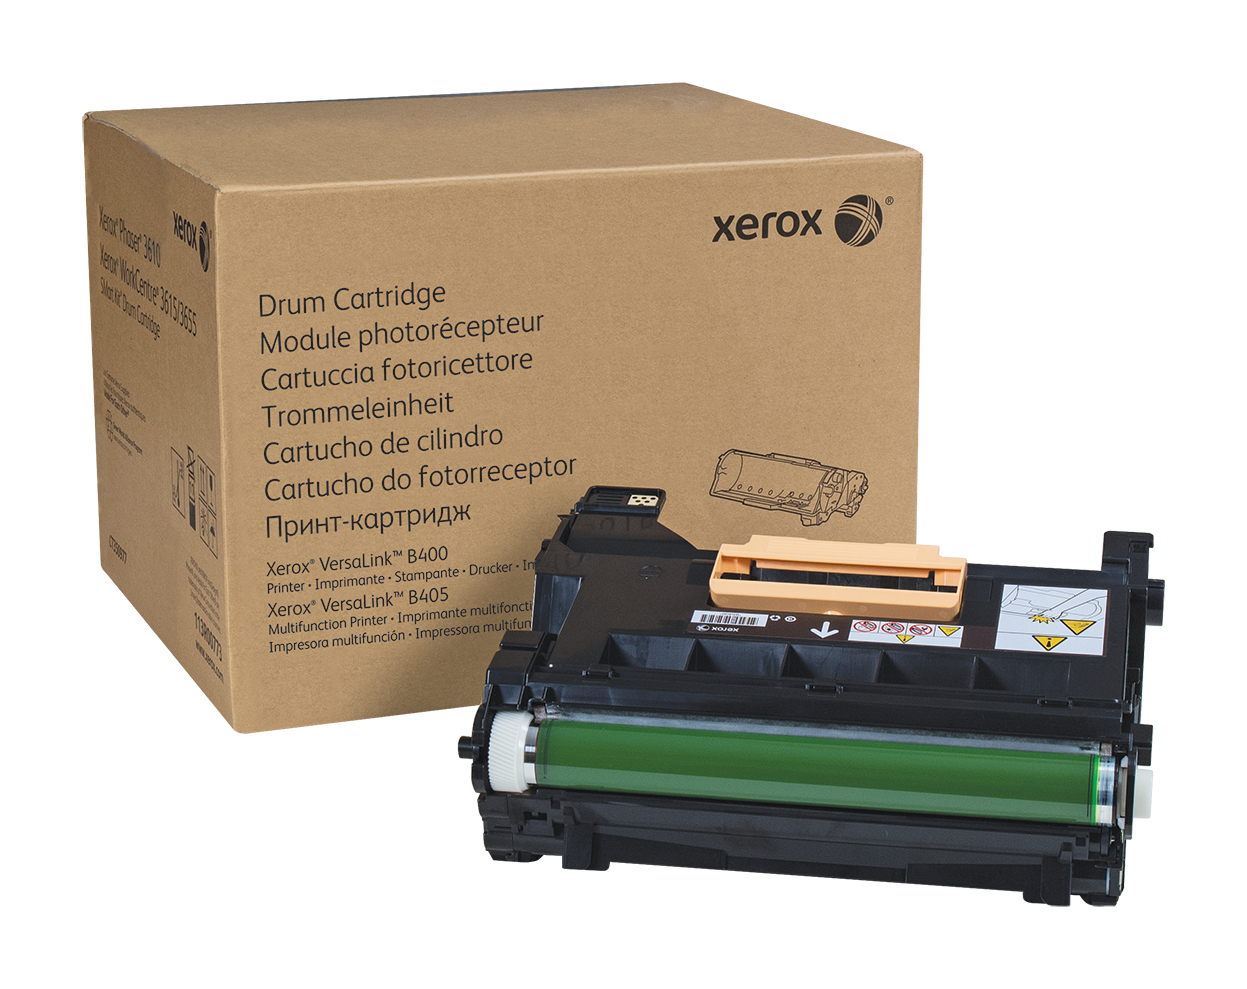 Xerox VersaLink B400/B405 Cartucho del cilindro